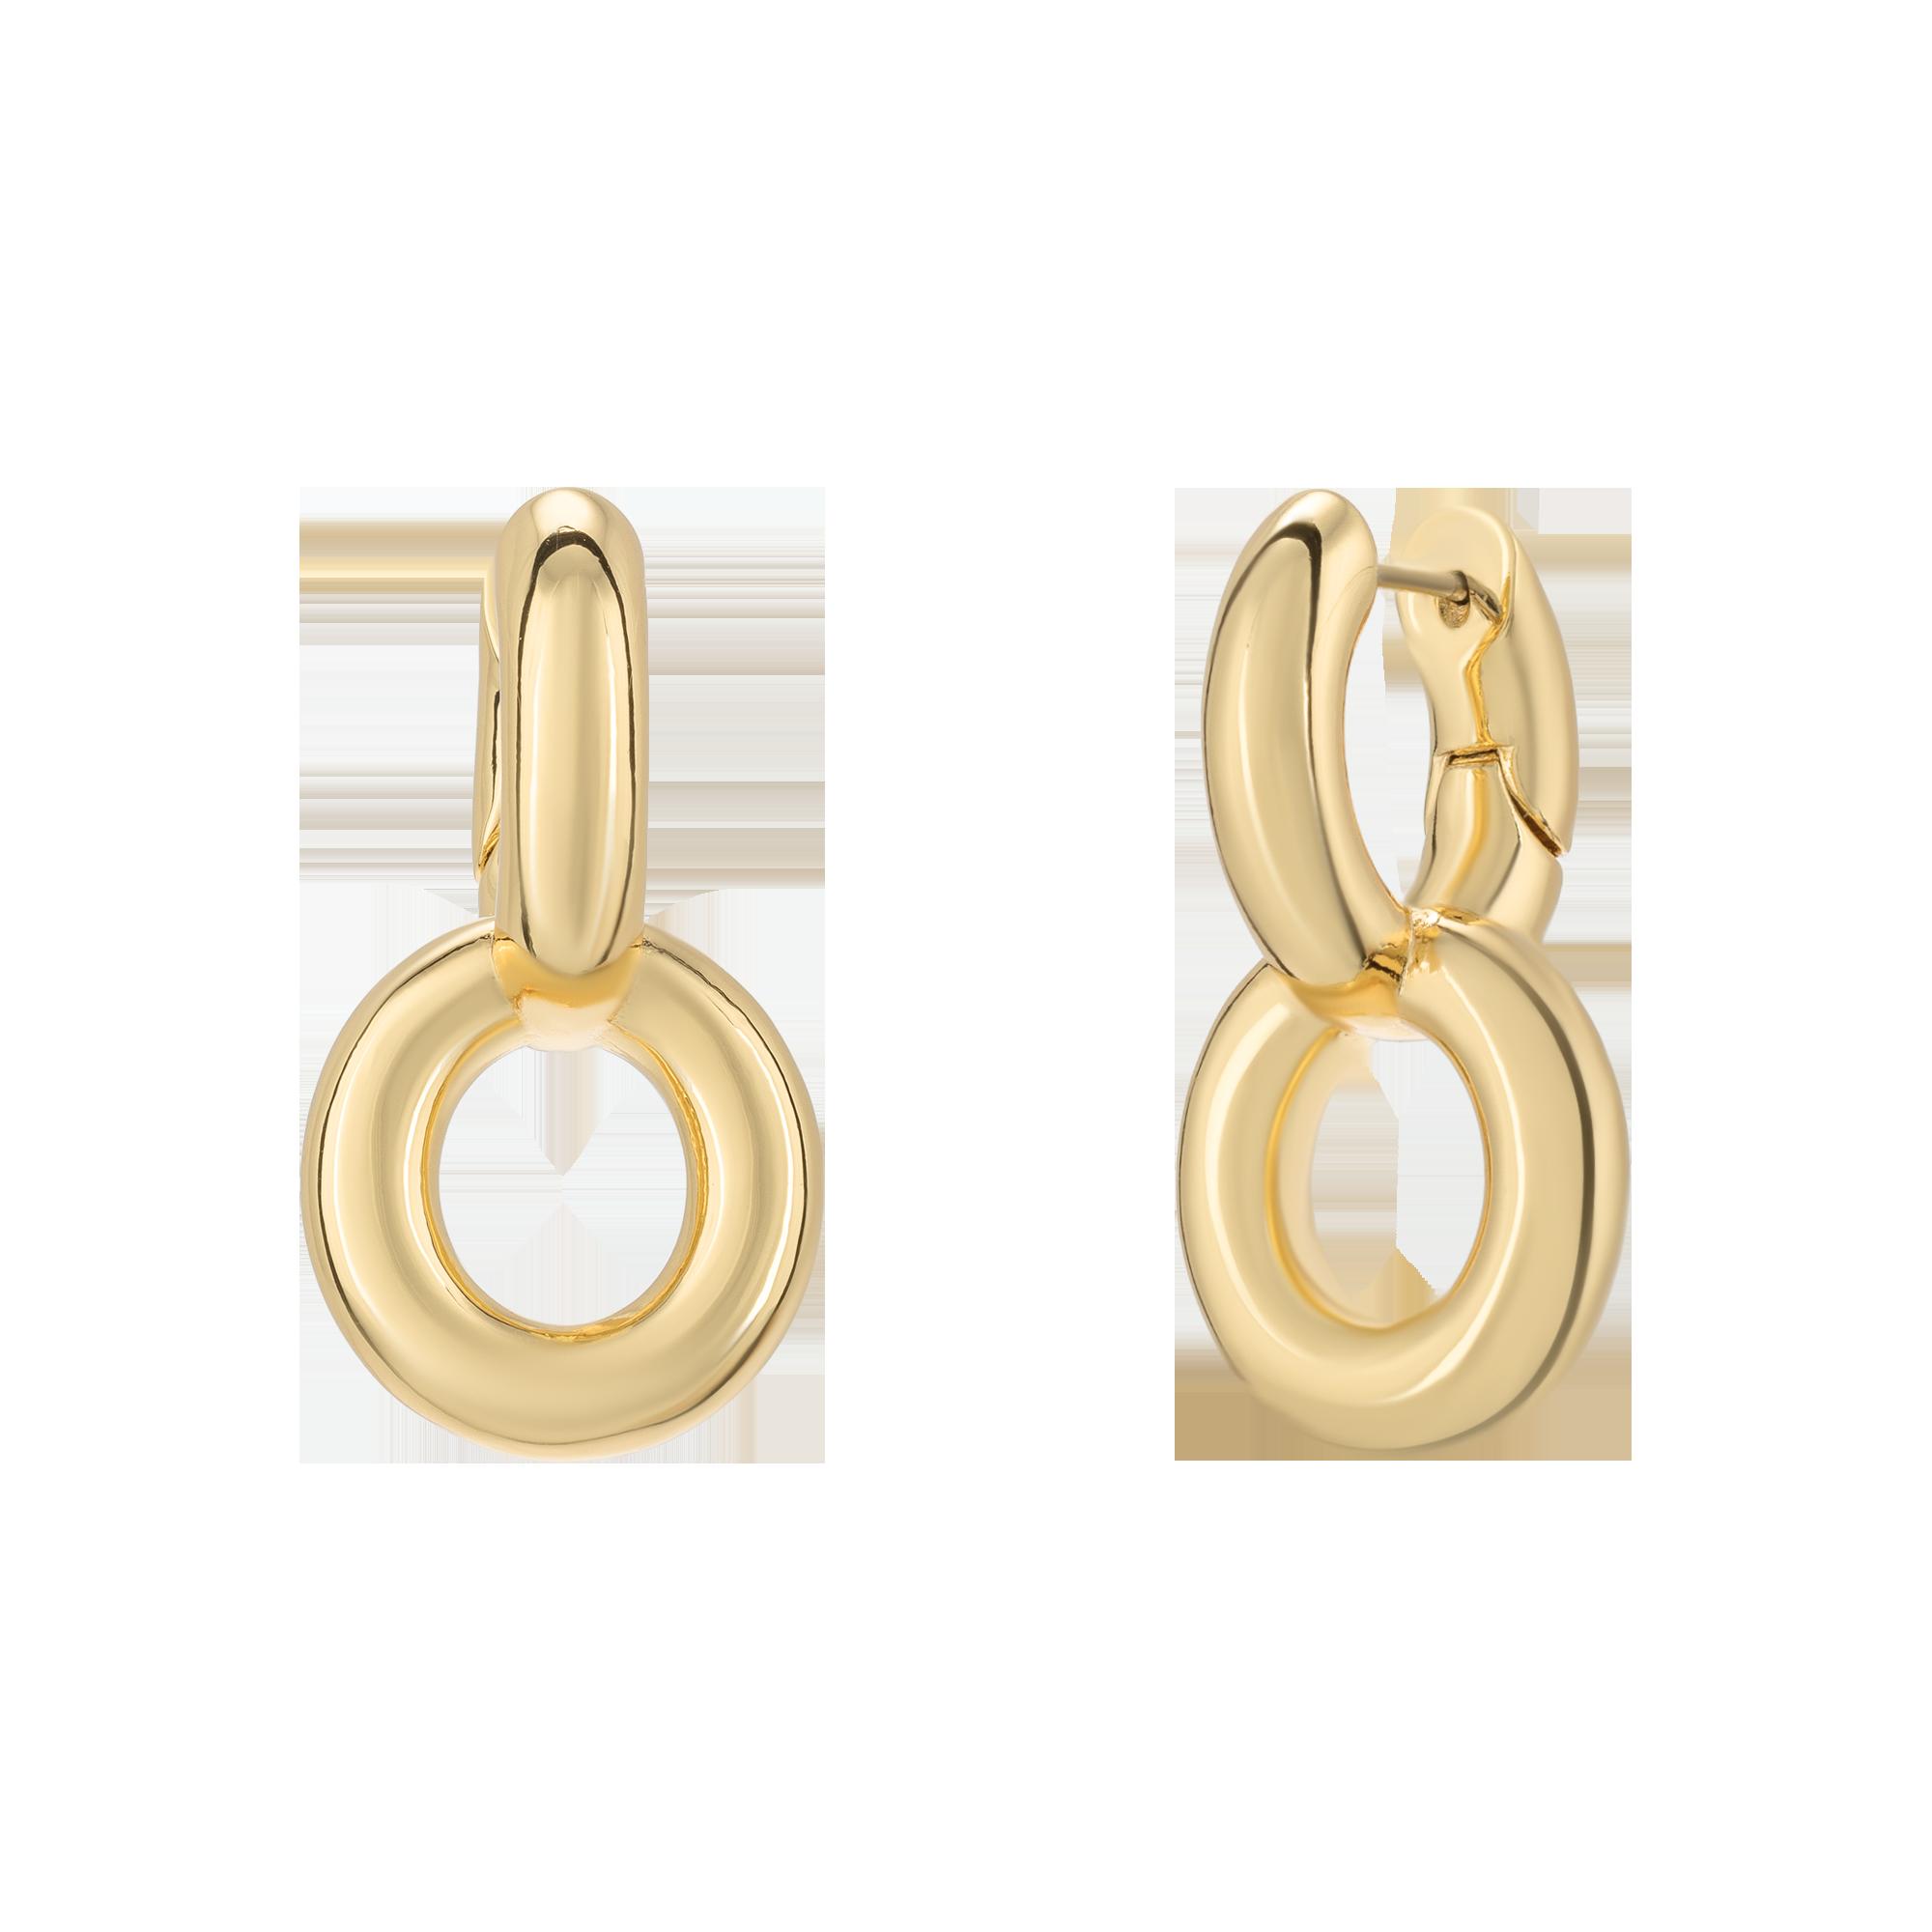 Golden massive earrings product image